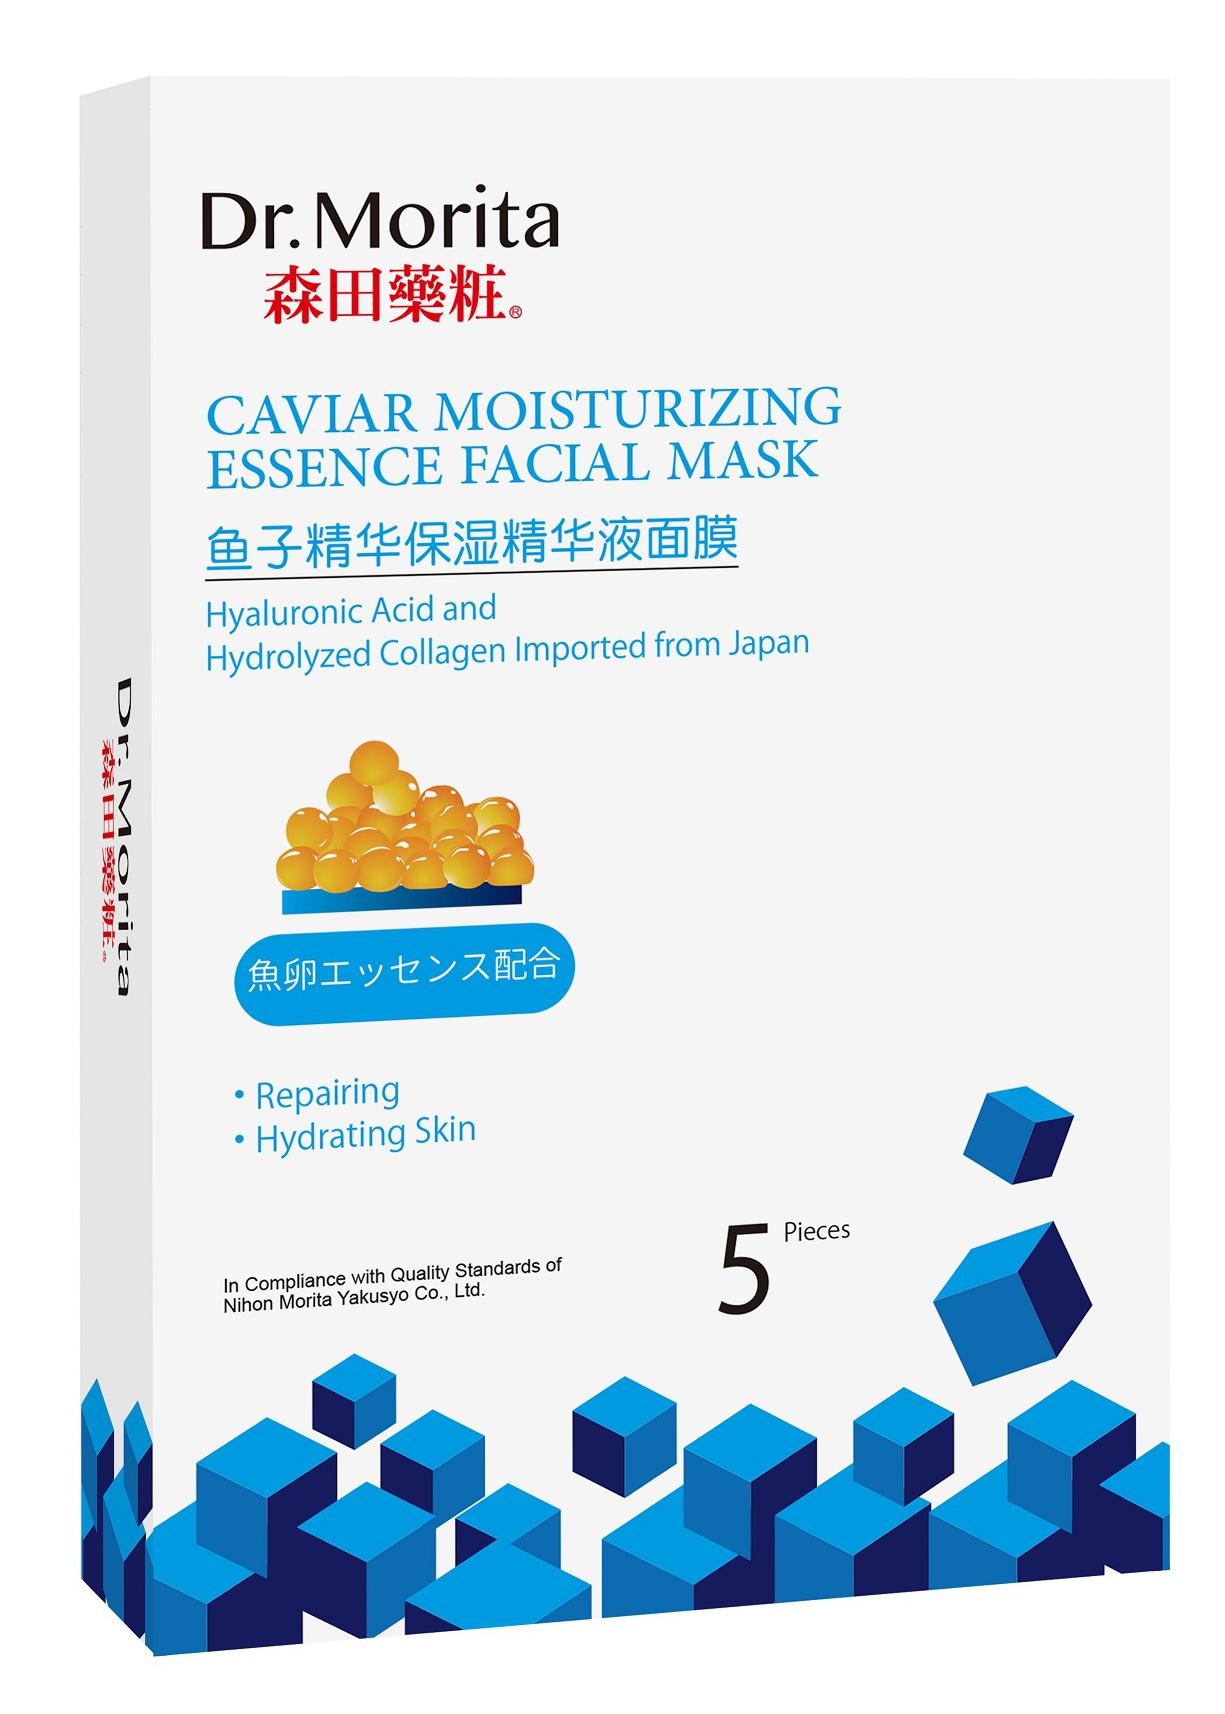 Dr.Morita Caviar Moisturizing Essence Facial Mask